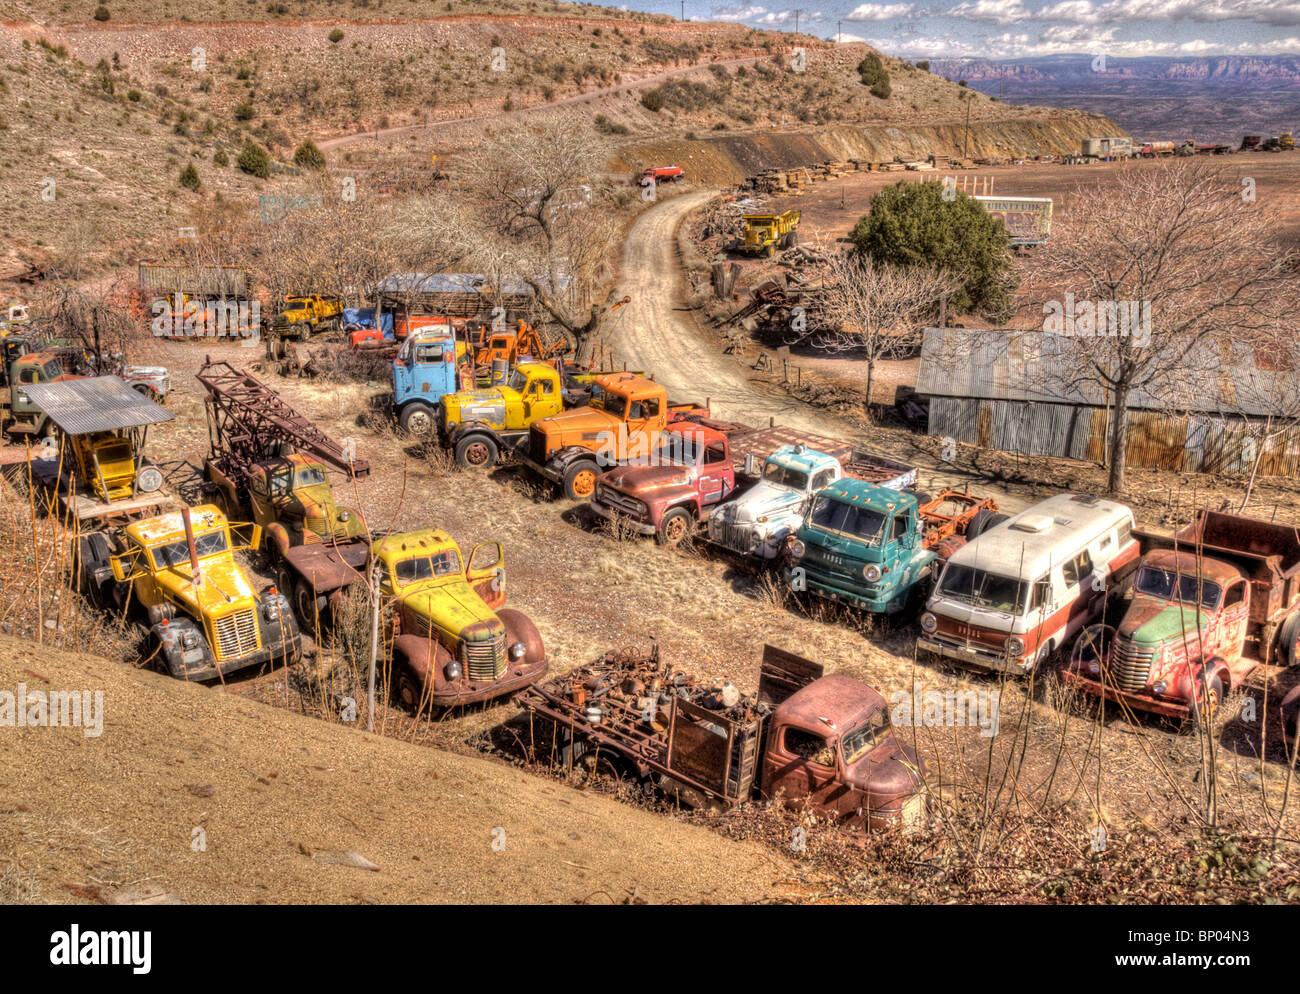 Old trucks Junk Yard Jerome Arizona Stock Photo